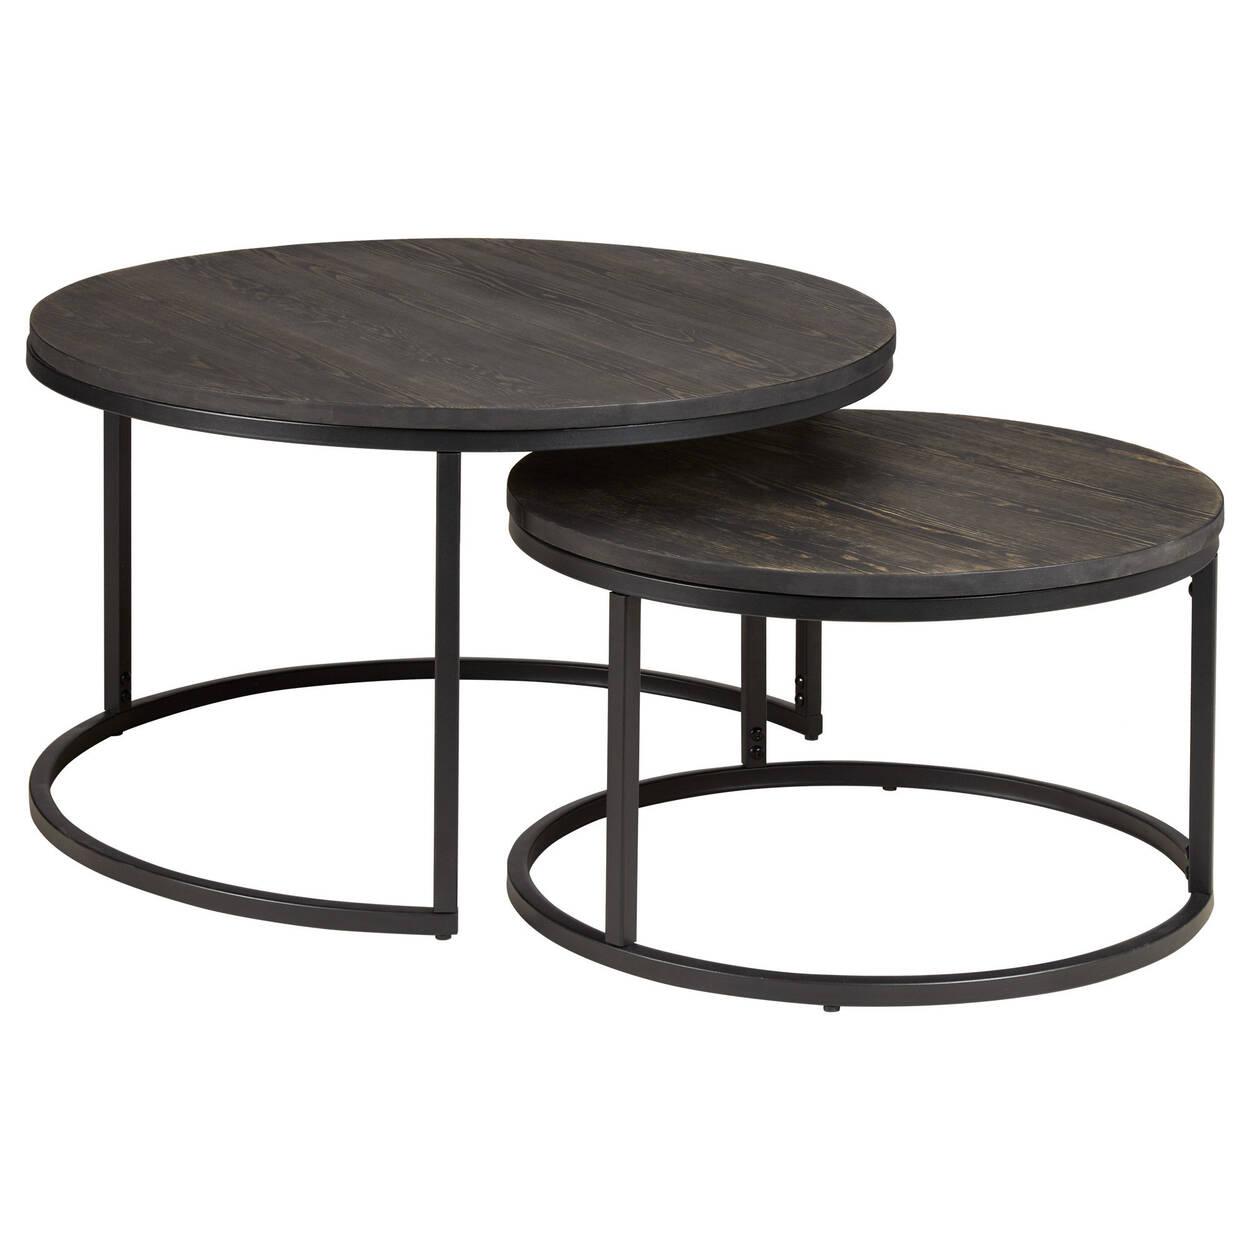 Bouclair Teak Coffee Table: Set Of 2 Wood Side Tables With Metal Legs